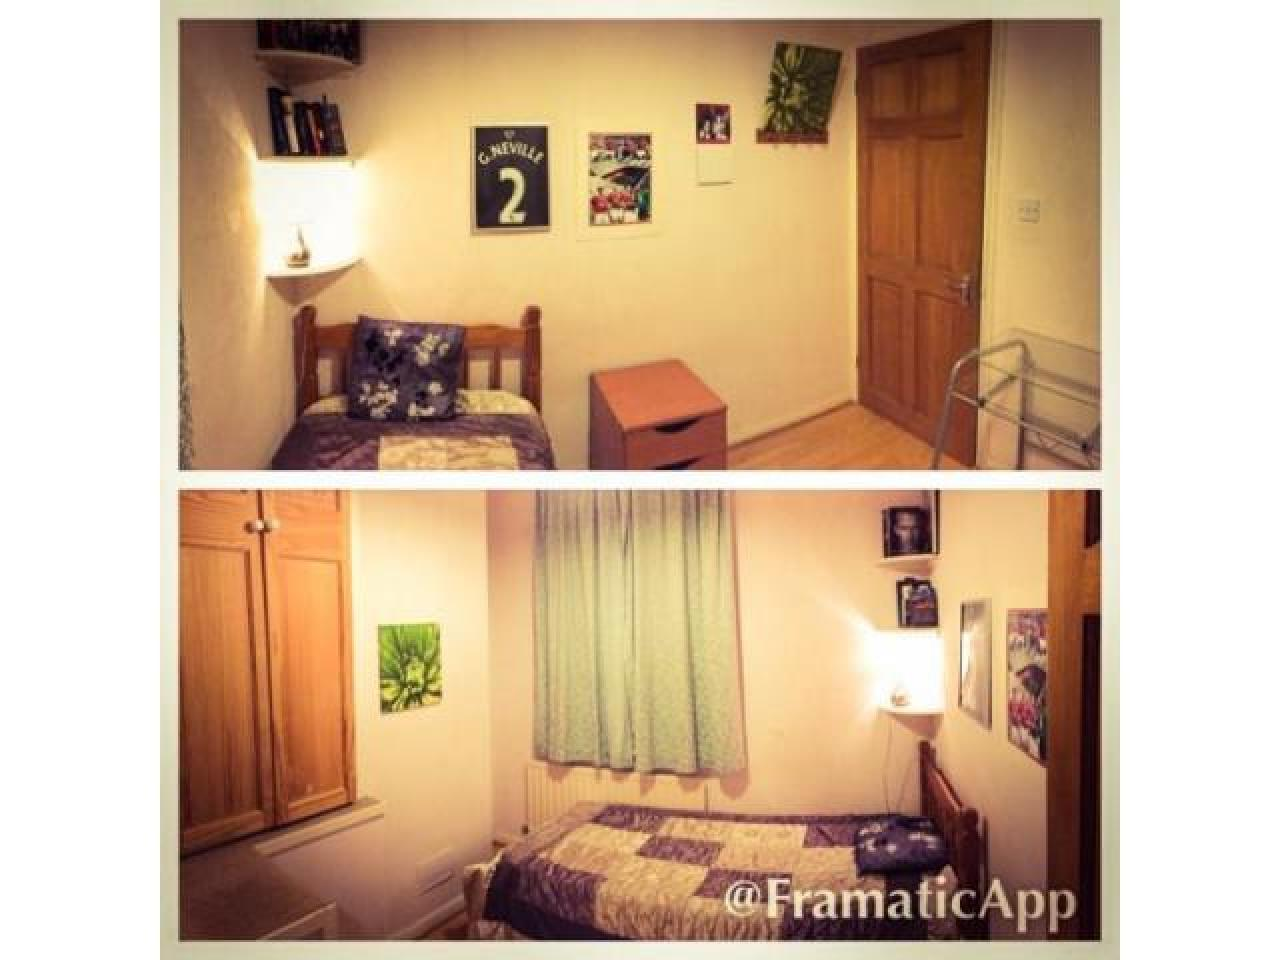 Сдаётся не большая комната в районе West Ham - Stratford - 1